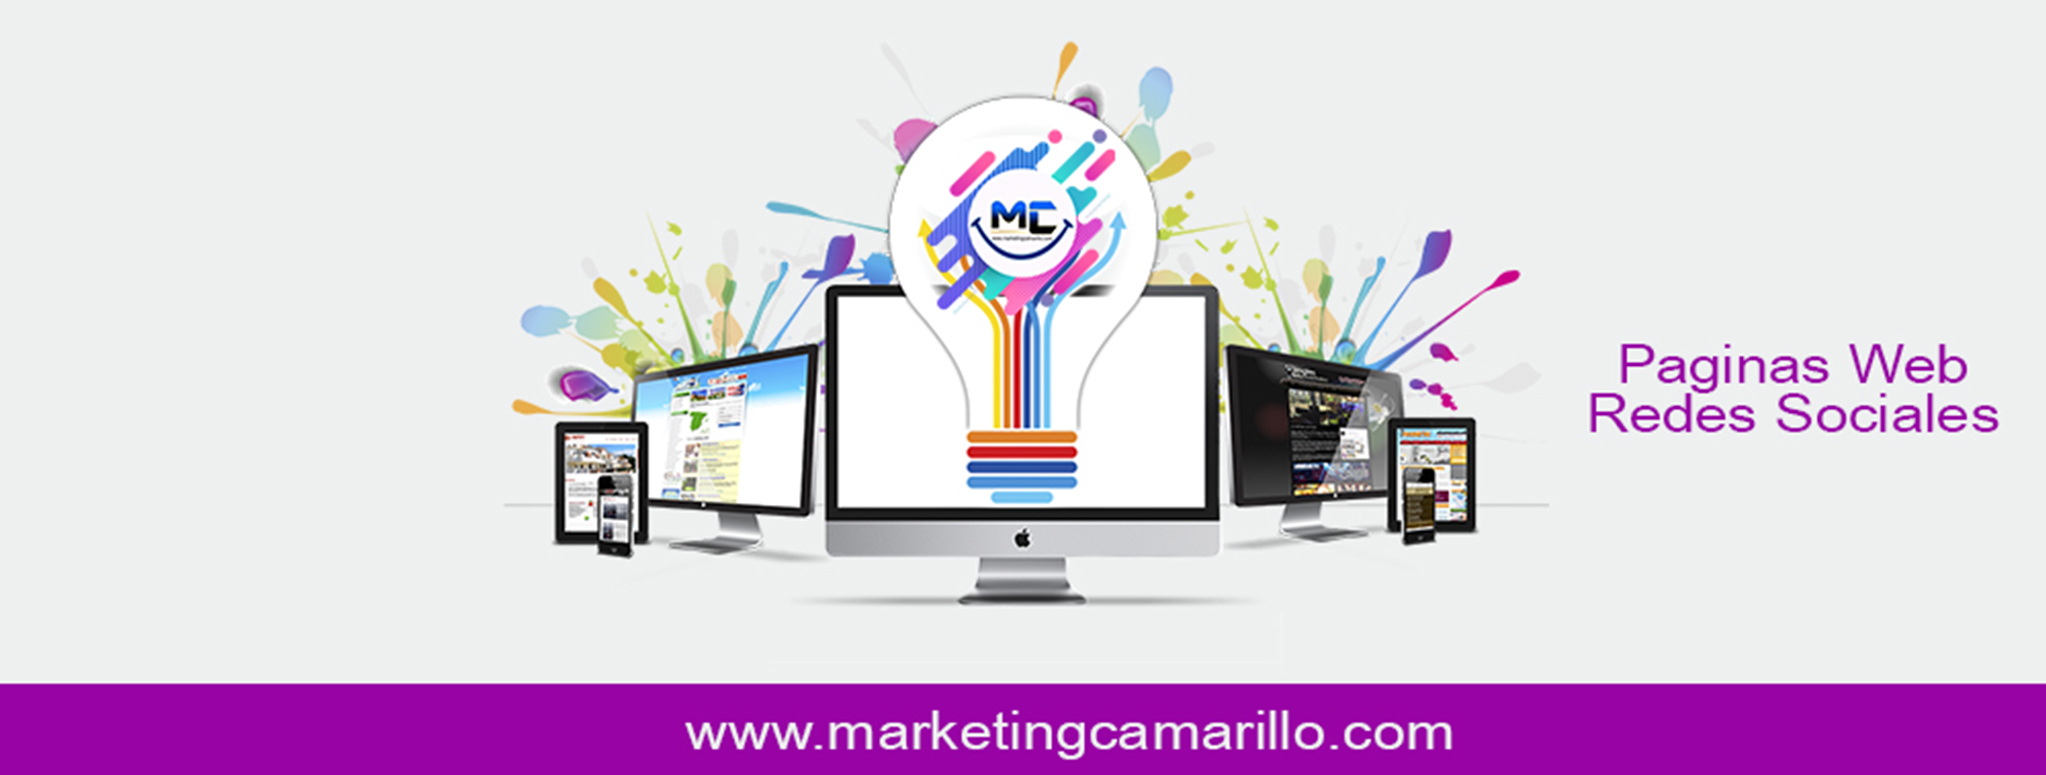 AGENCIA DE MARKETING-CAMARILLO-CREACION-DE-LOGOS-1024x388 2021 paginas web